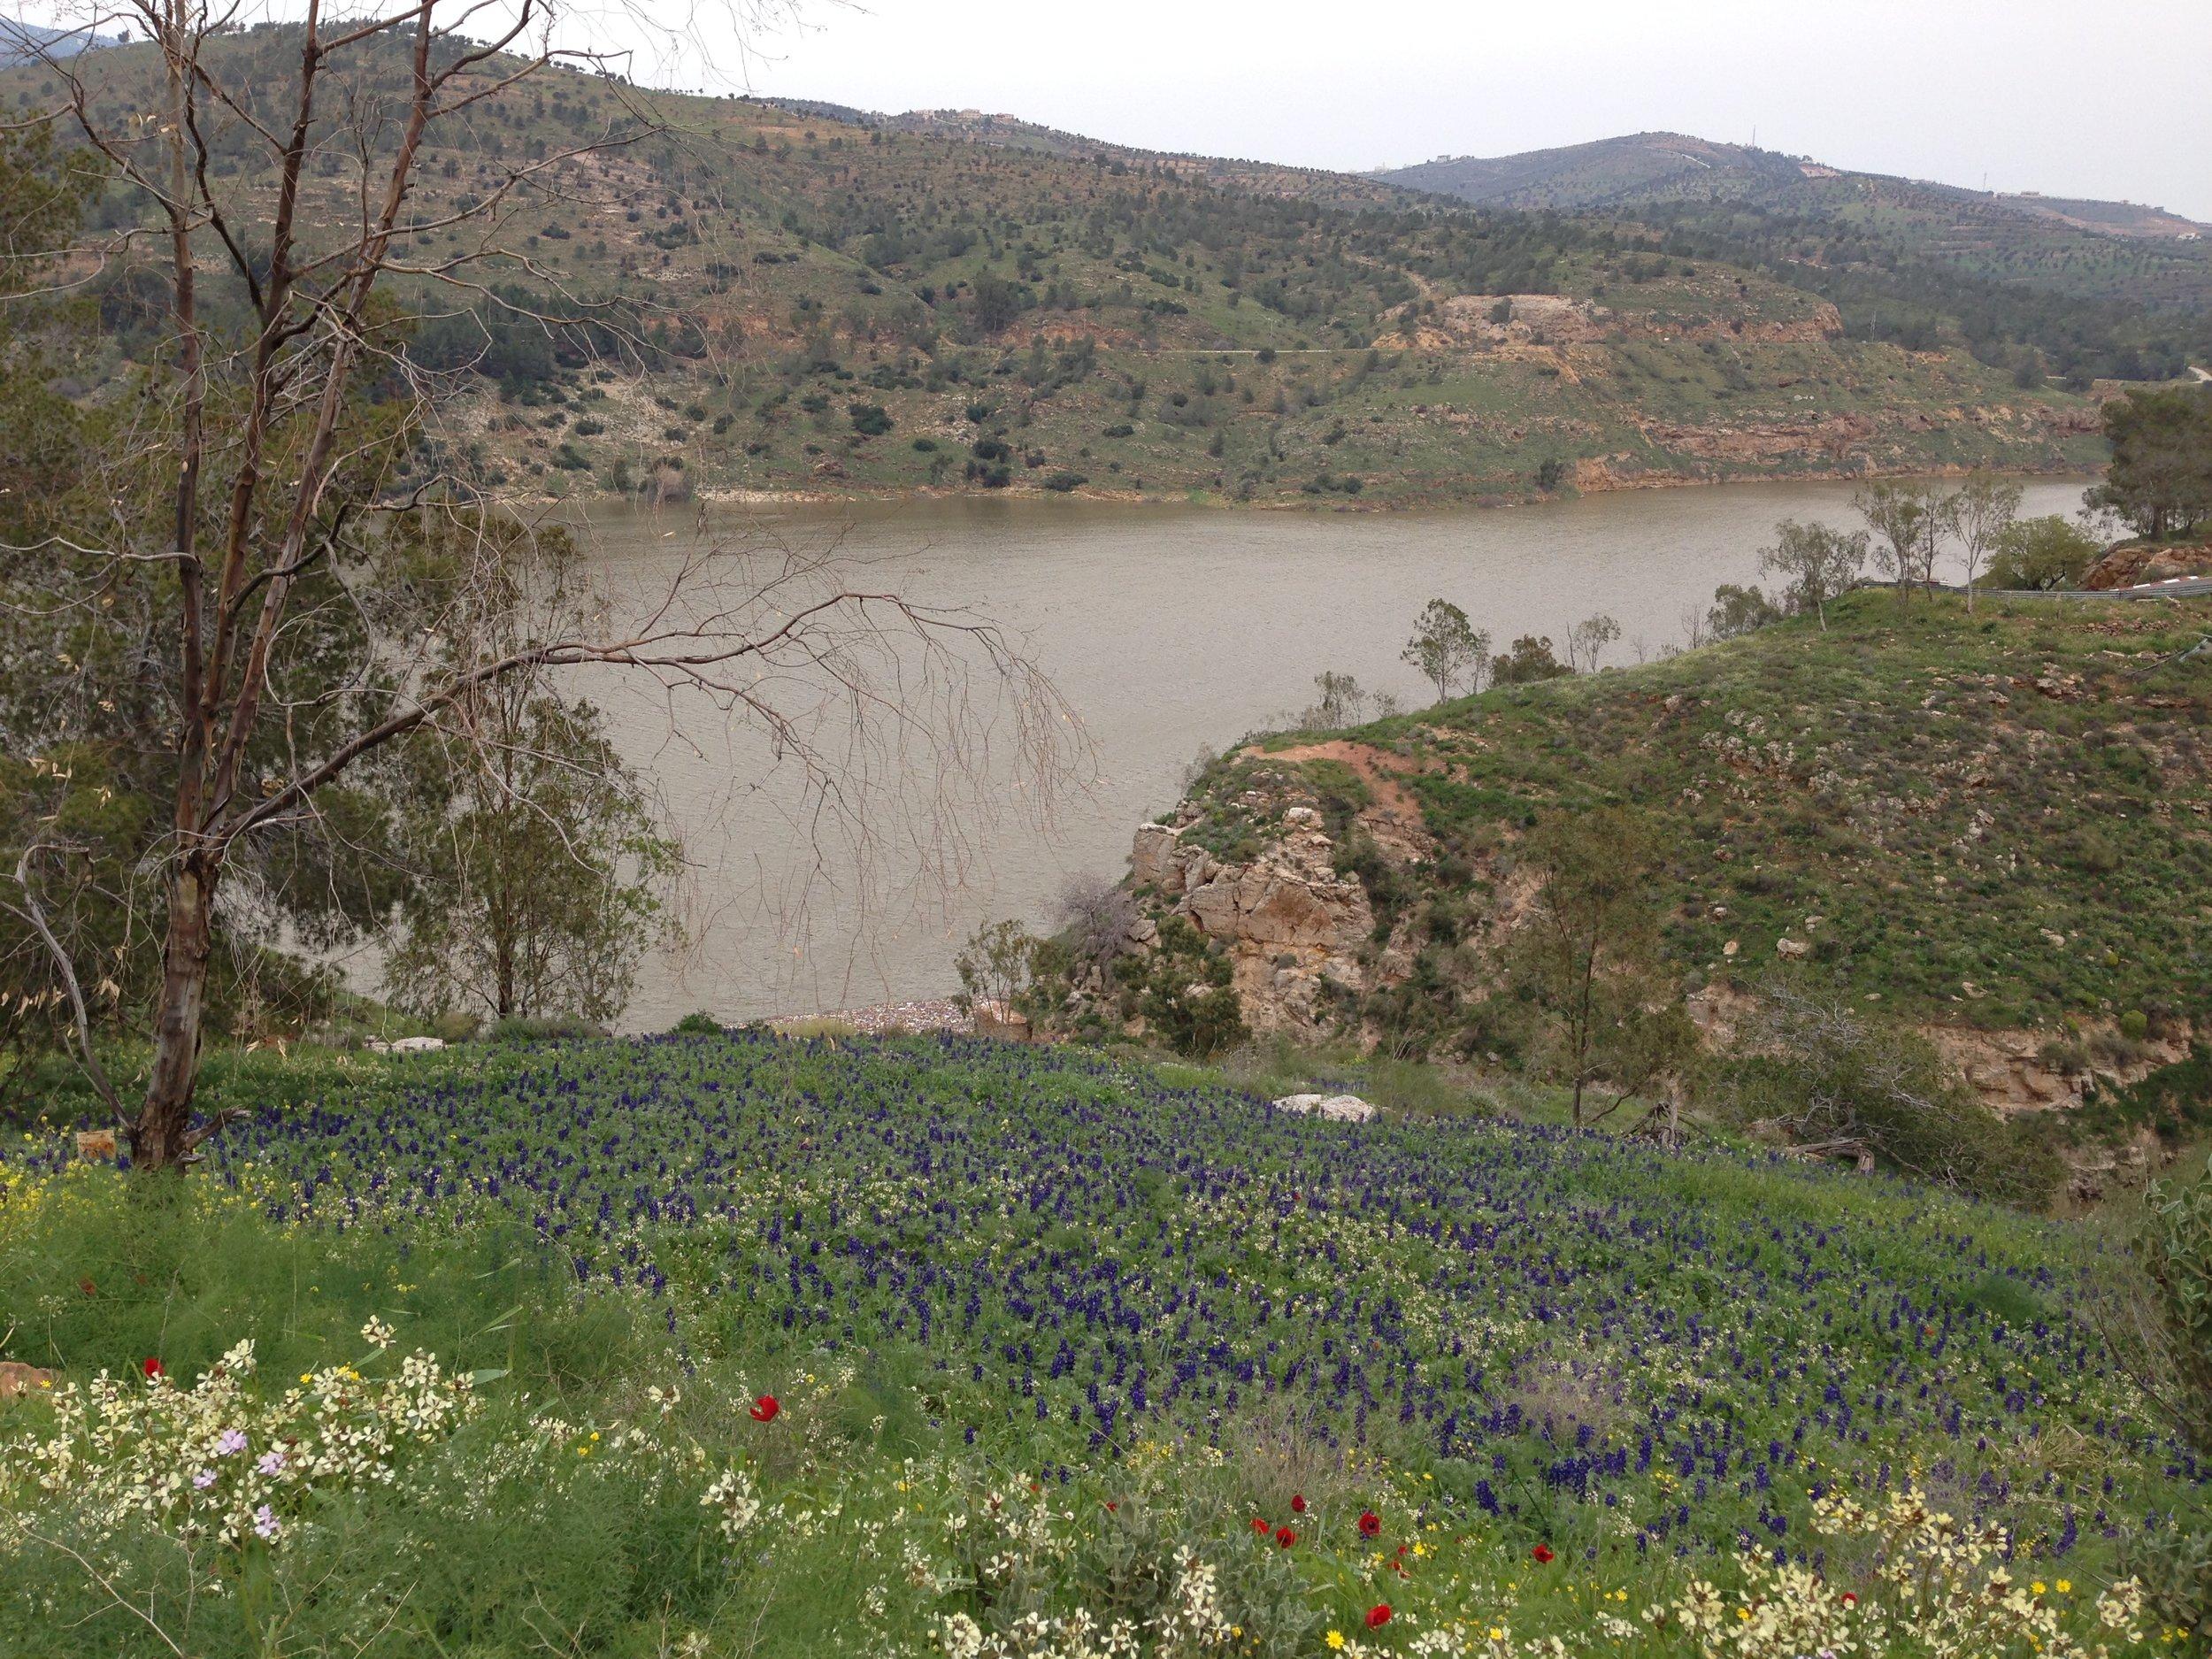 lupinus-pilosus-rbg-site-over-looking-king-talal-dam.jpg